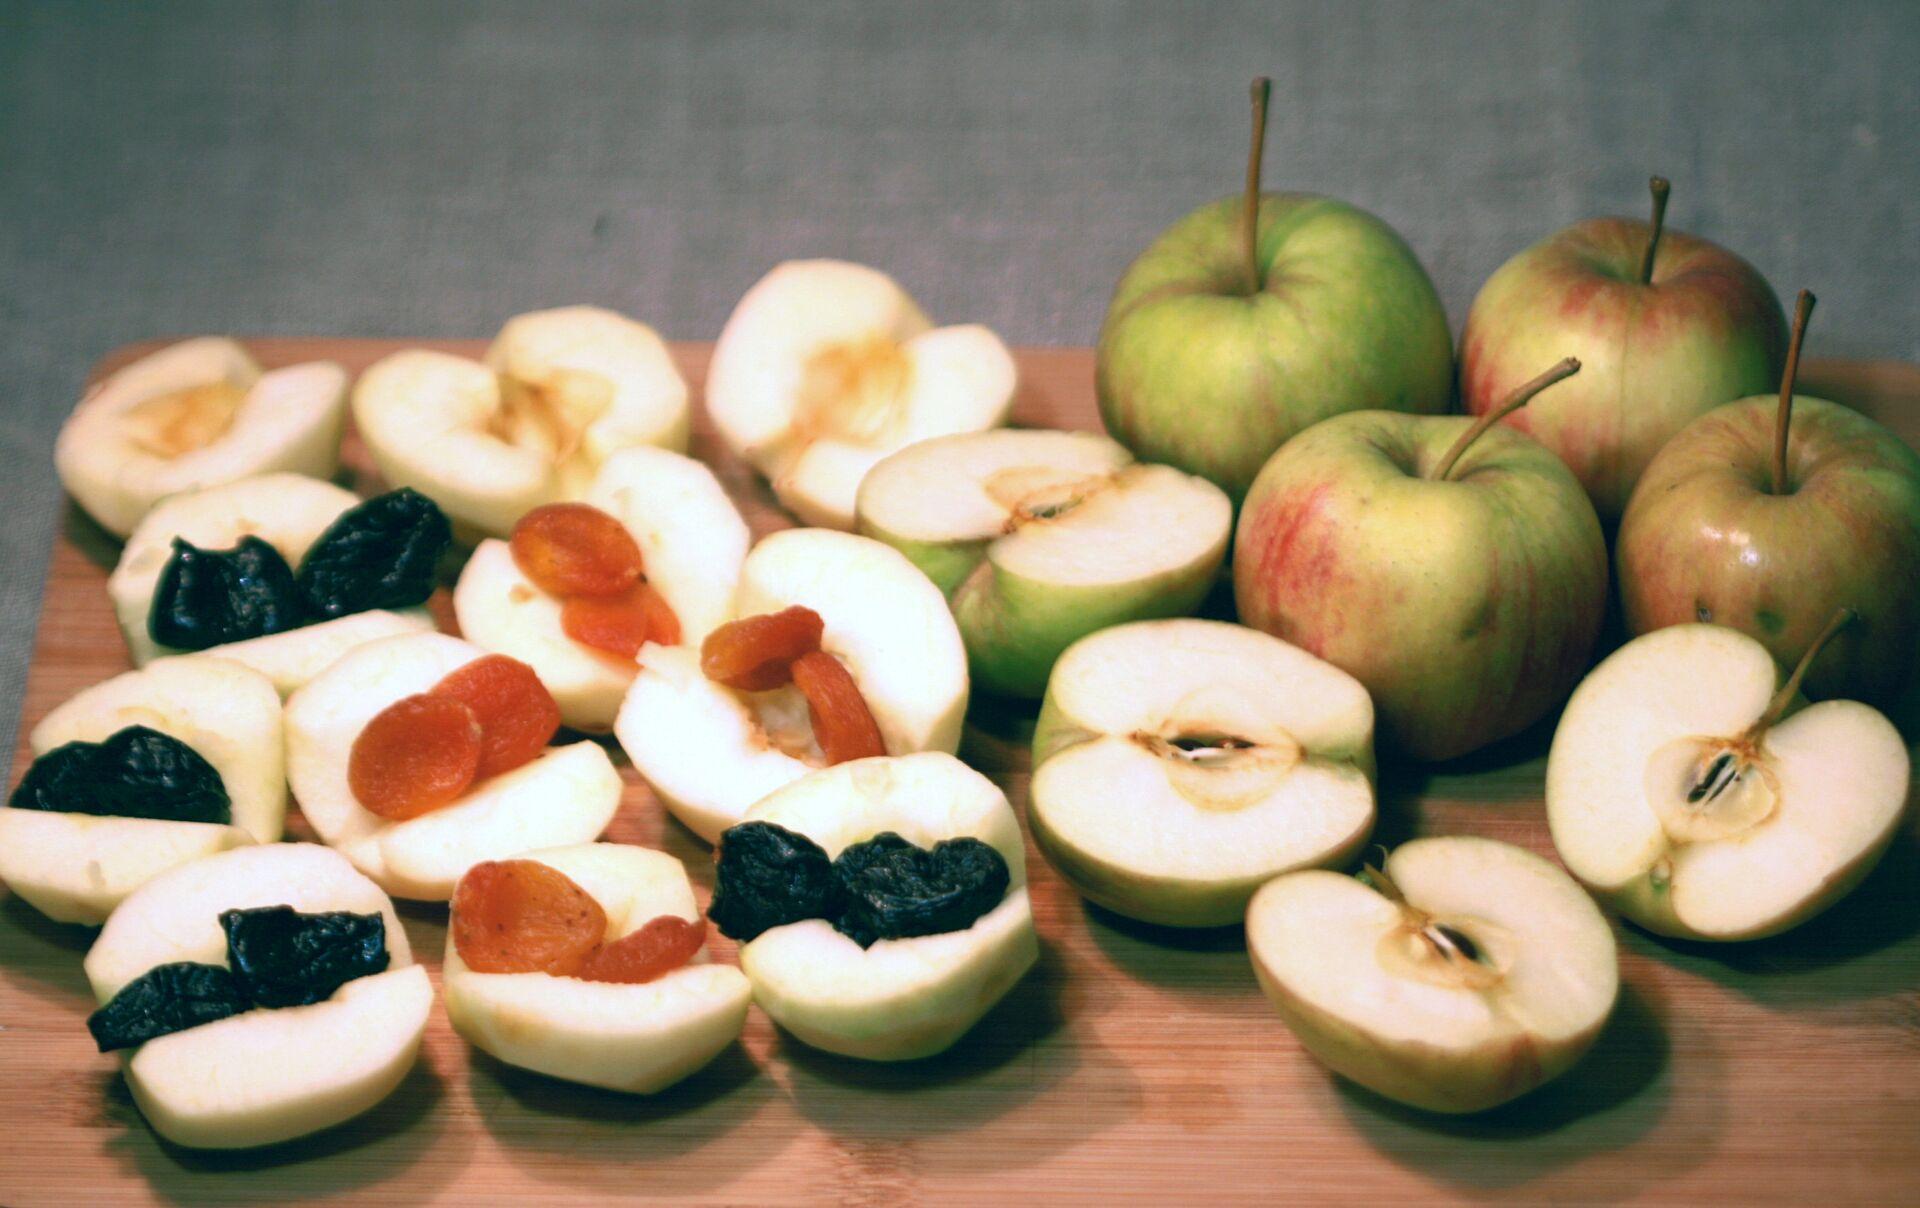 Осенний пирог с яблоками - Sputnik Беларусь, 1920, 19.08.2021